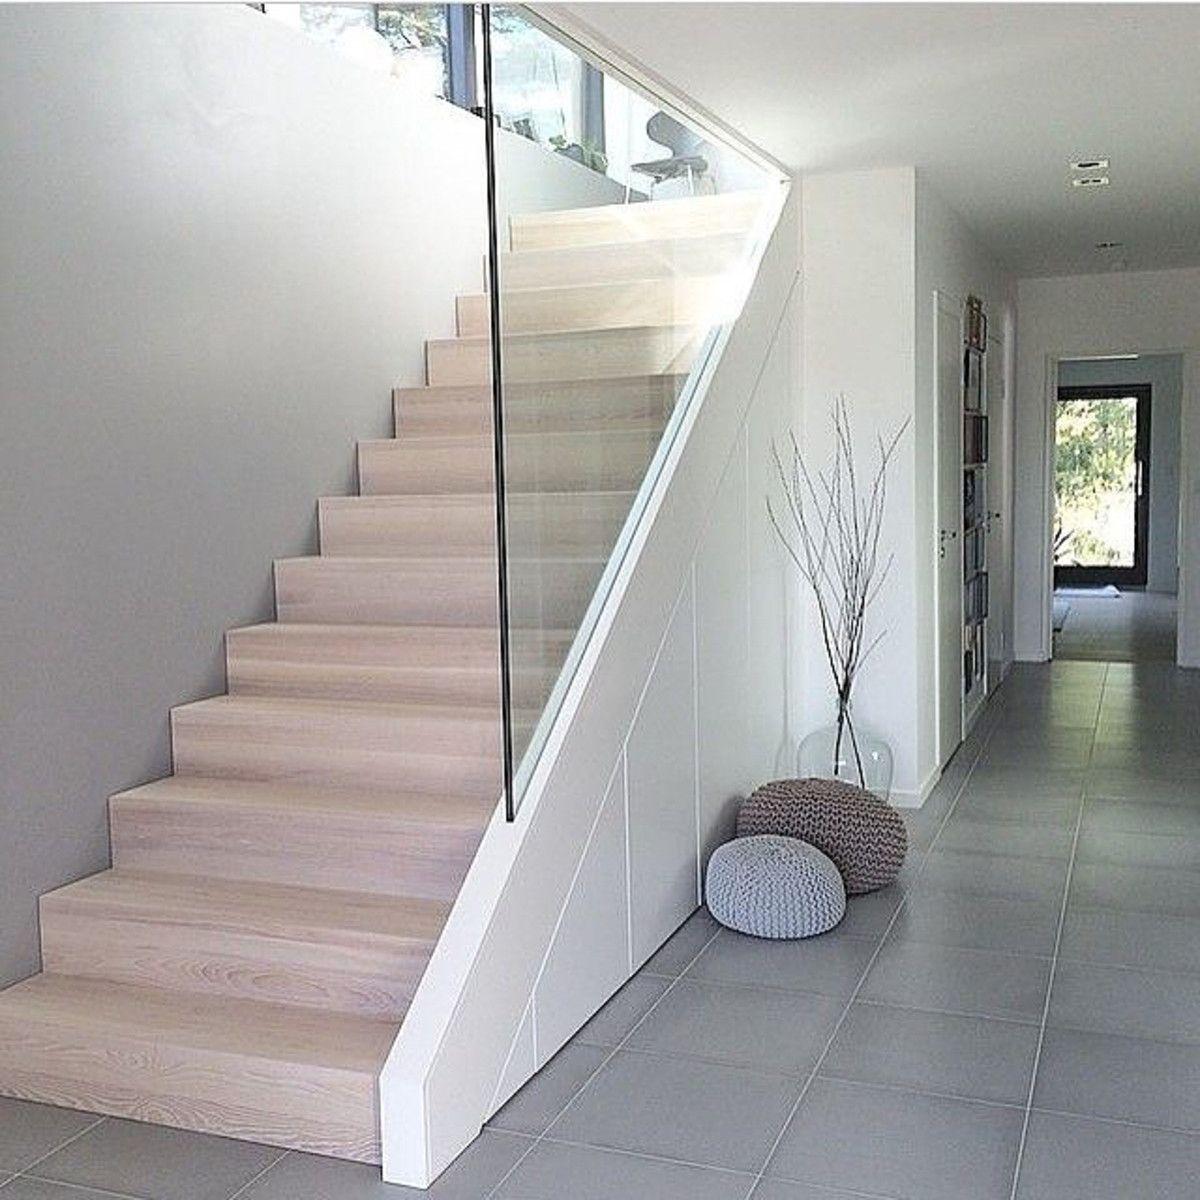 Minimal Interior Design Inspiration | Staircase design ...